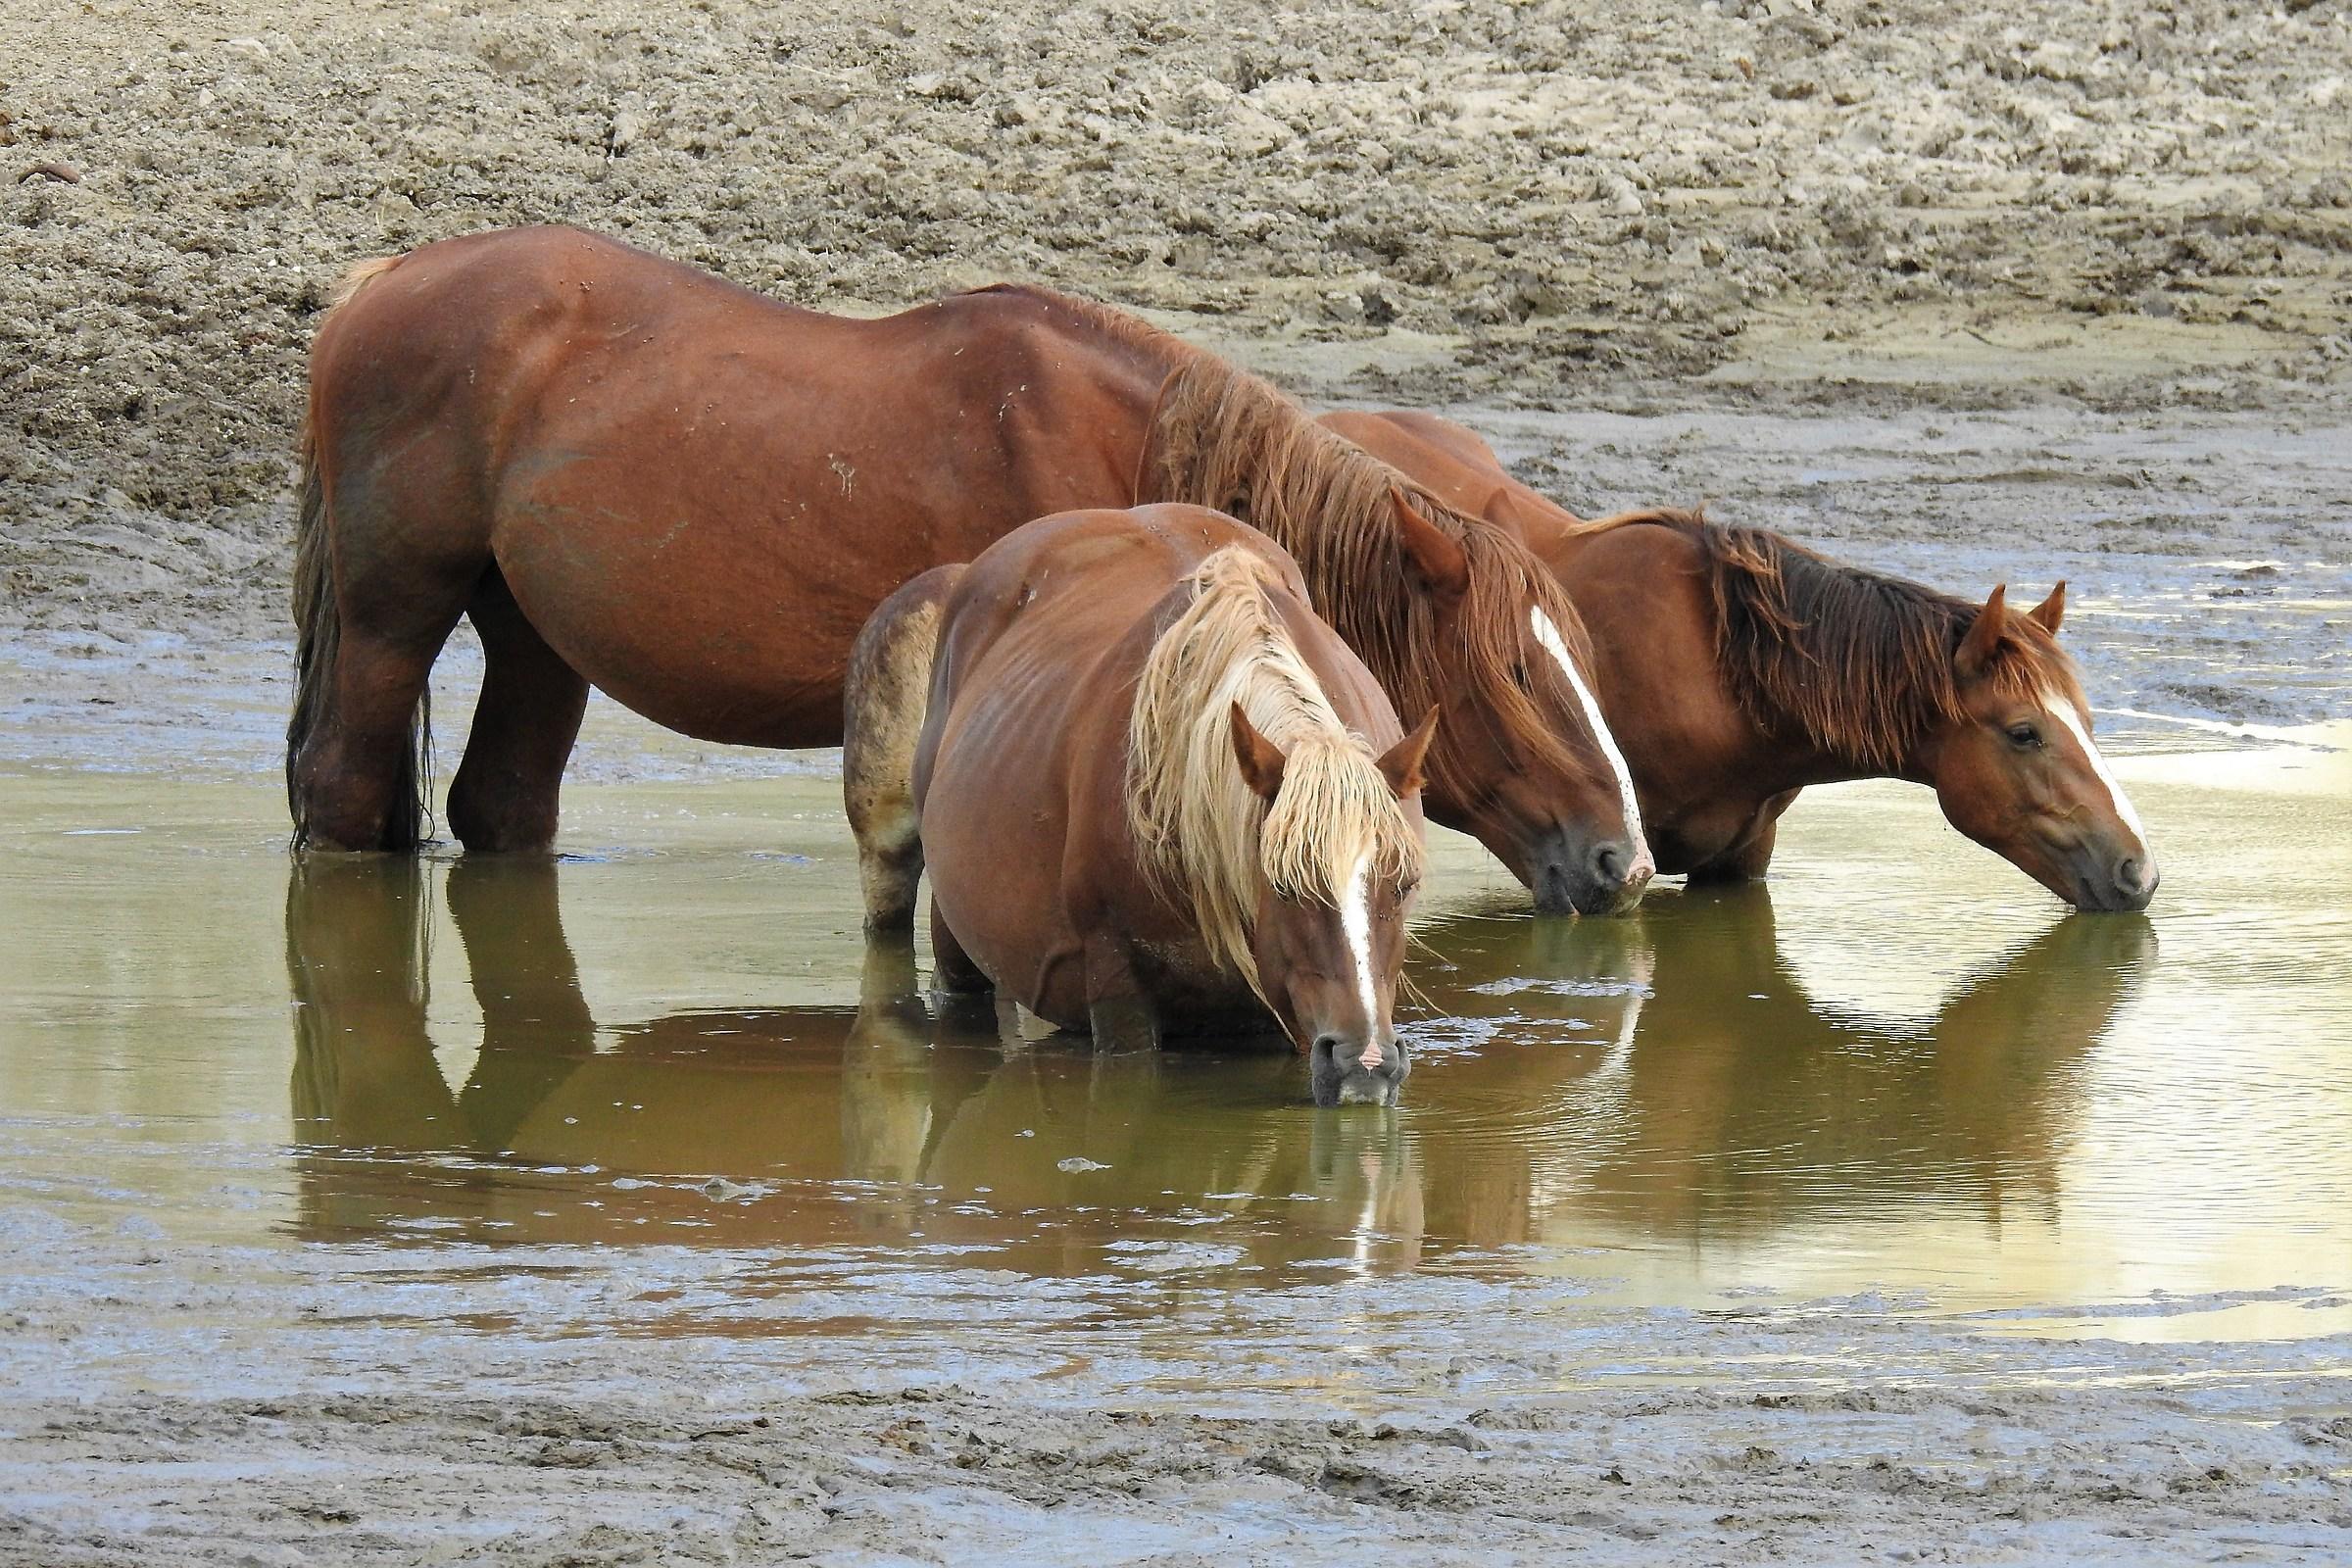 Horses in the brado-watering state...